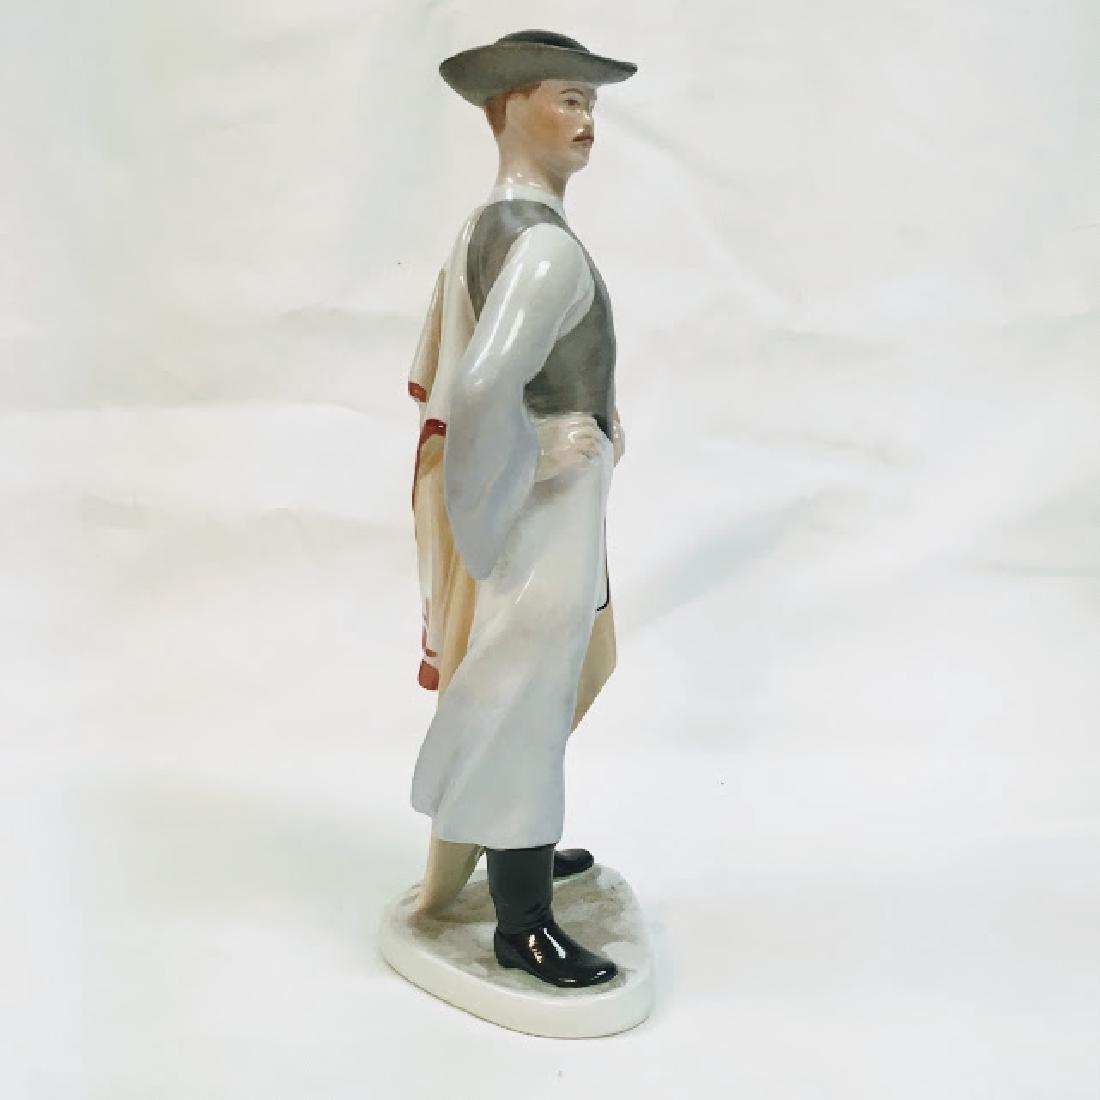 Kezifestes Budapest man in traditional costume figurine - 2